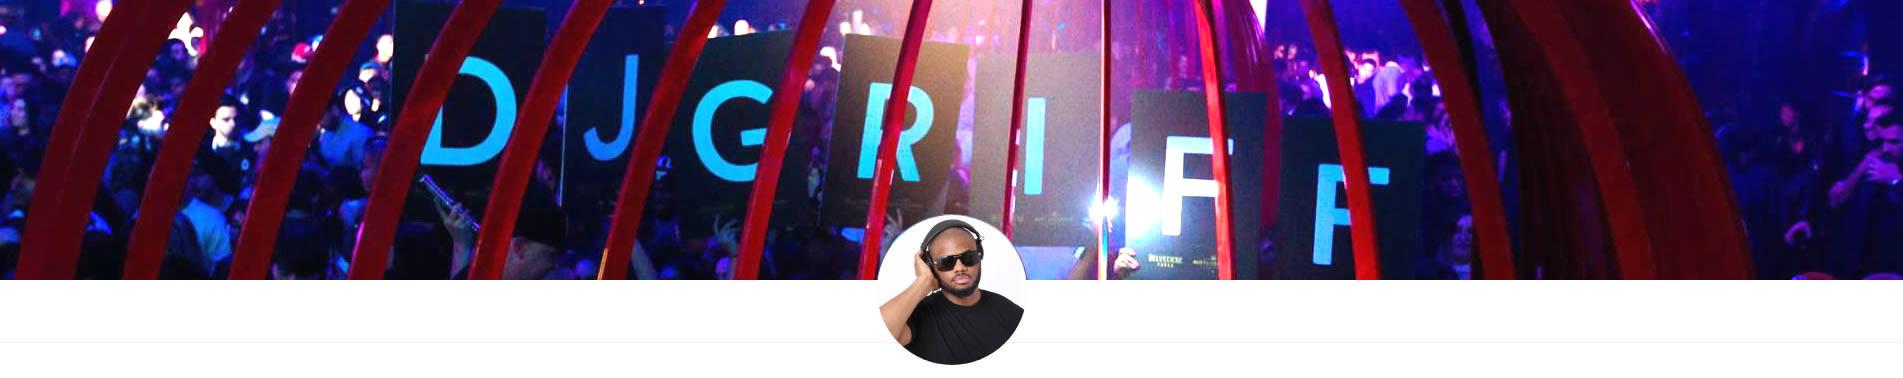 Dj Griff's Official Website - Toronto's Hip Hop King